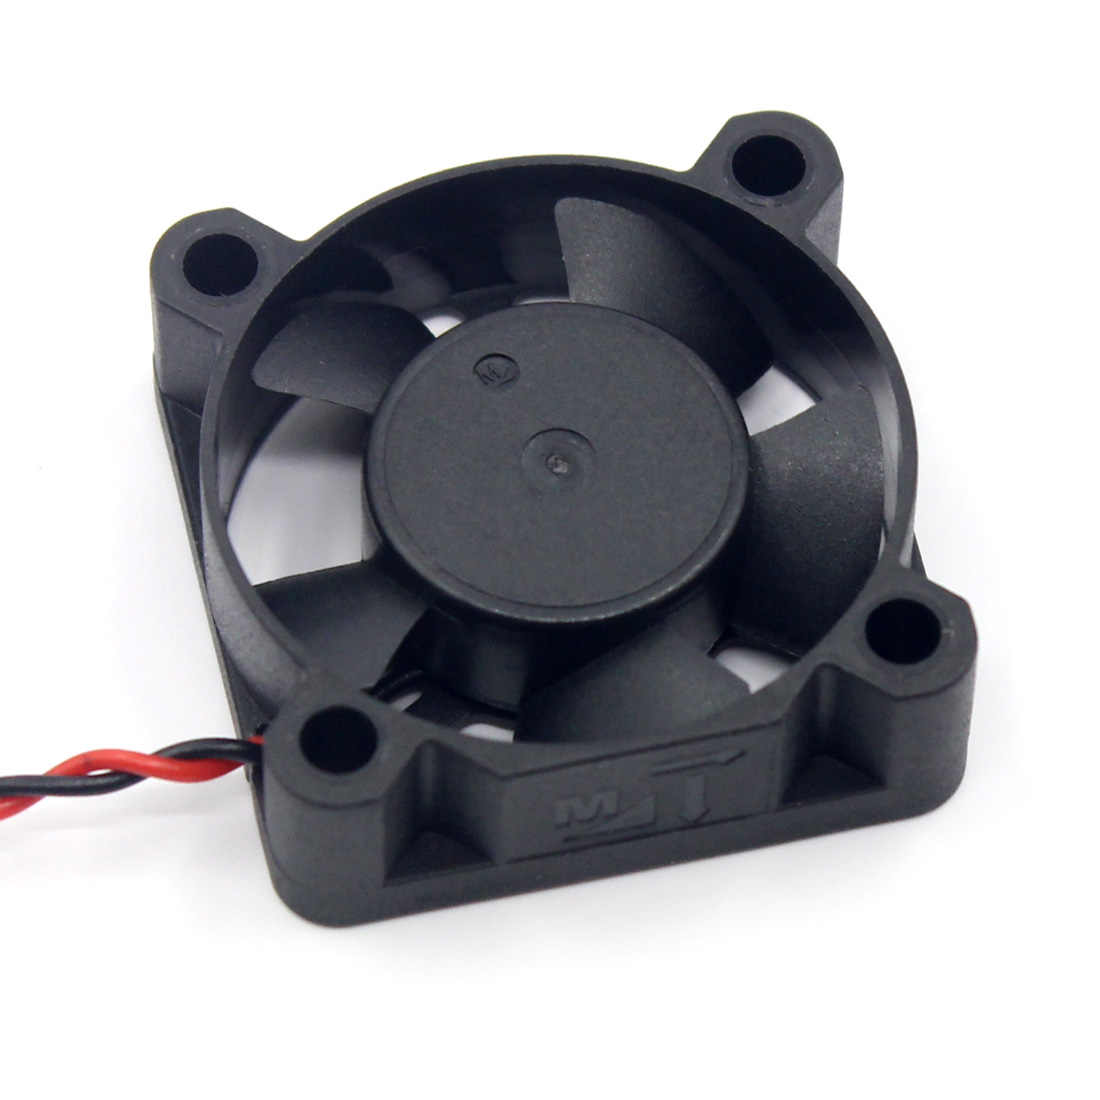 Hobbywing MP3010SH 5V ESC Cooling Fan MP3010SH-5V 30*30*10mm for QUICRUN 10BL60 / EZRUN-WP-SC8  / SCT PRO Speed Controller